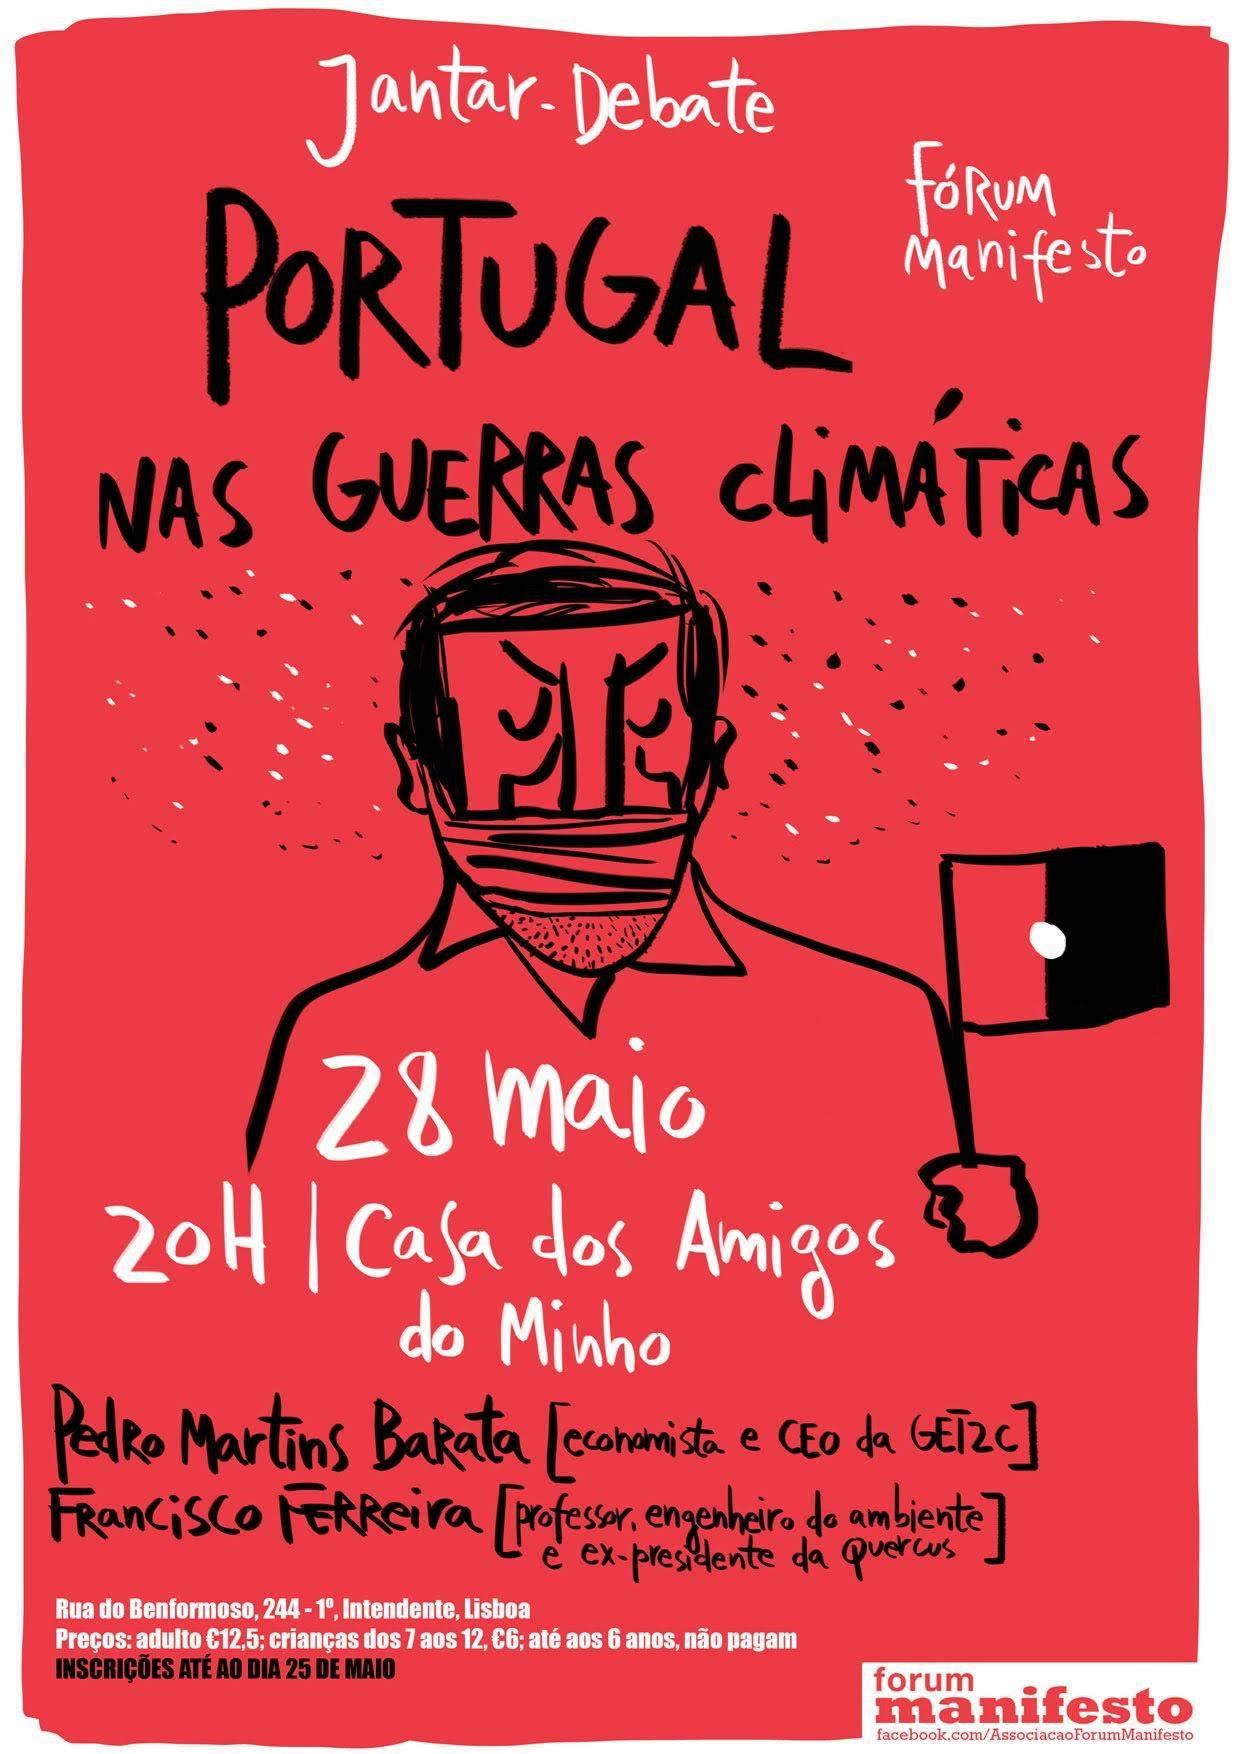 Jantar-Debate_PortugalNasGuerrasClimaticas